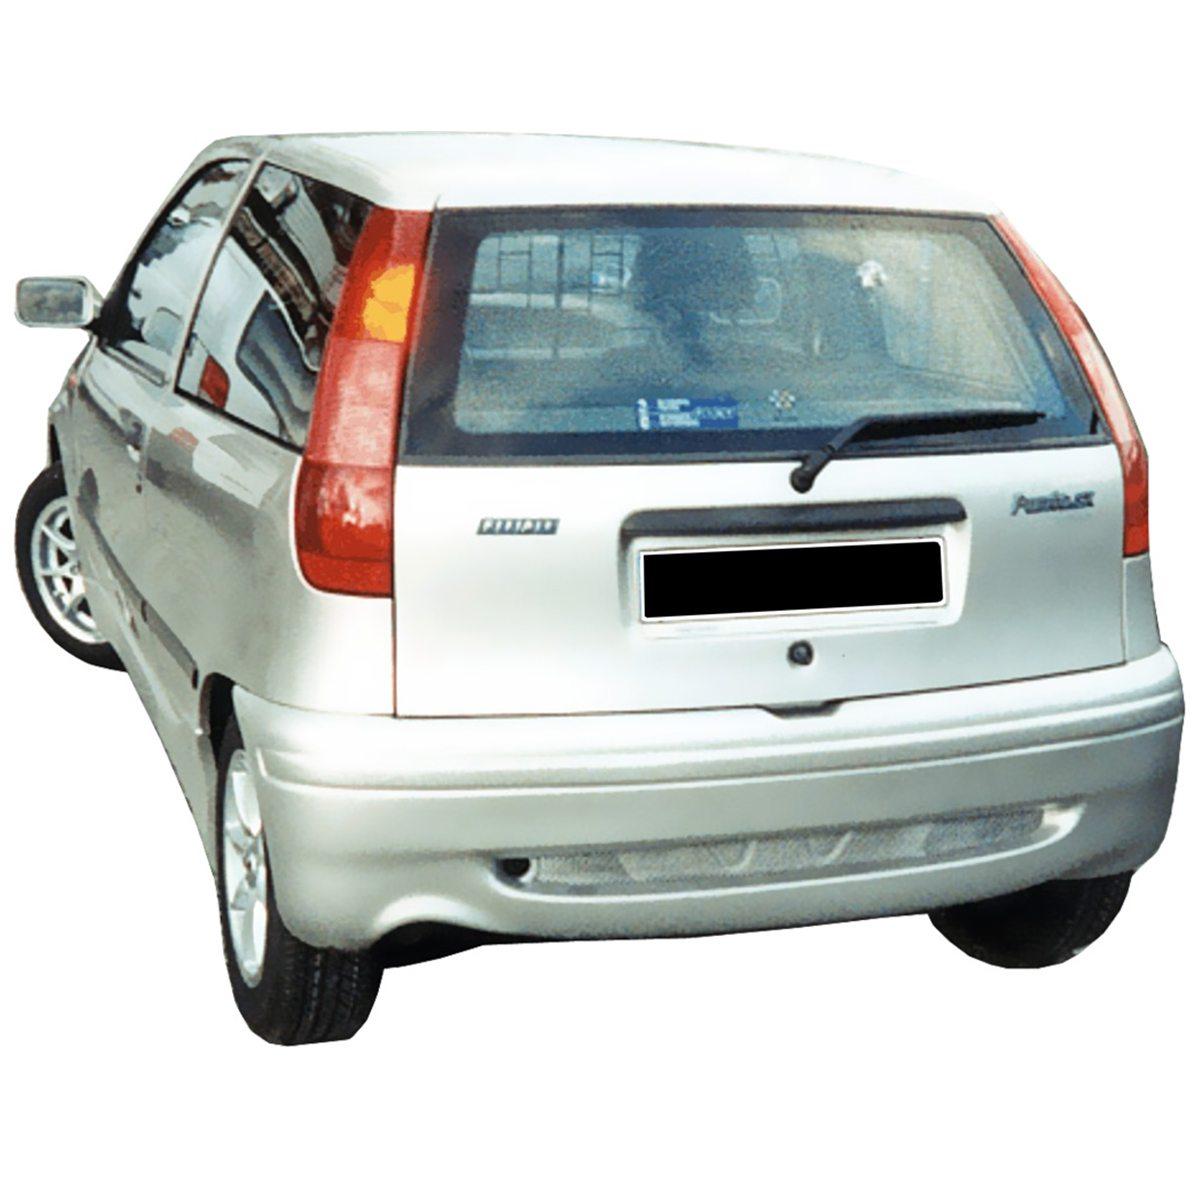 Fiat Punto (93-99) – Para-choques tras Abarth